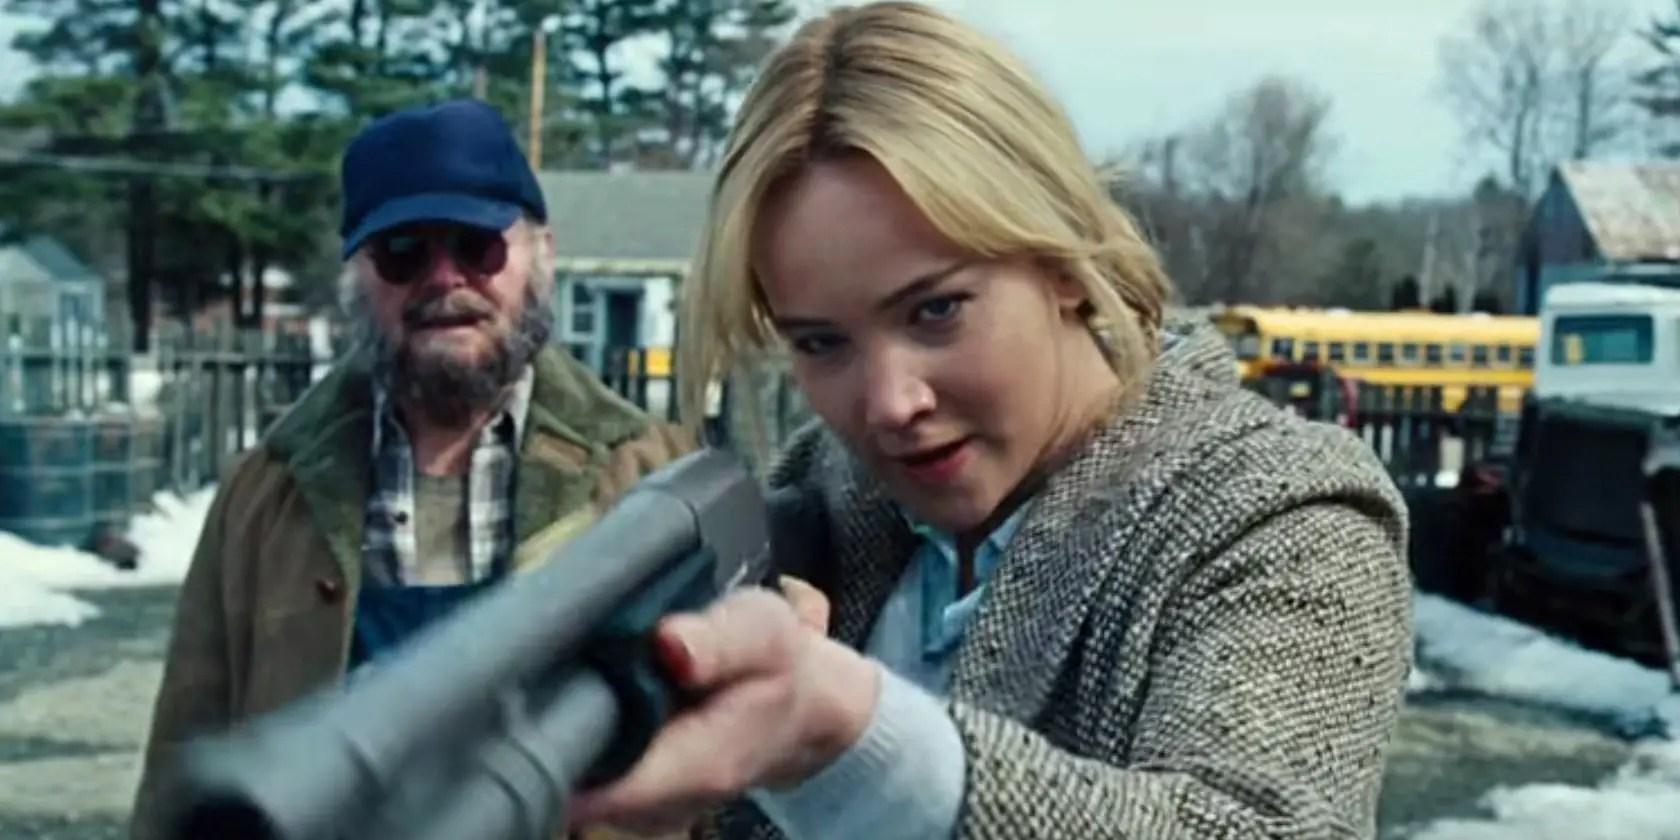 https://i1.wp.com/static1.businessinsider.com/image/5627f6009dd7cc19008c3b32-1200-630/jennifer-lawrence-saves-her-latest-oscar-hopeful-movie-joy-from-being-a-total-disaster.jpg